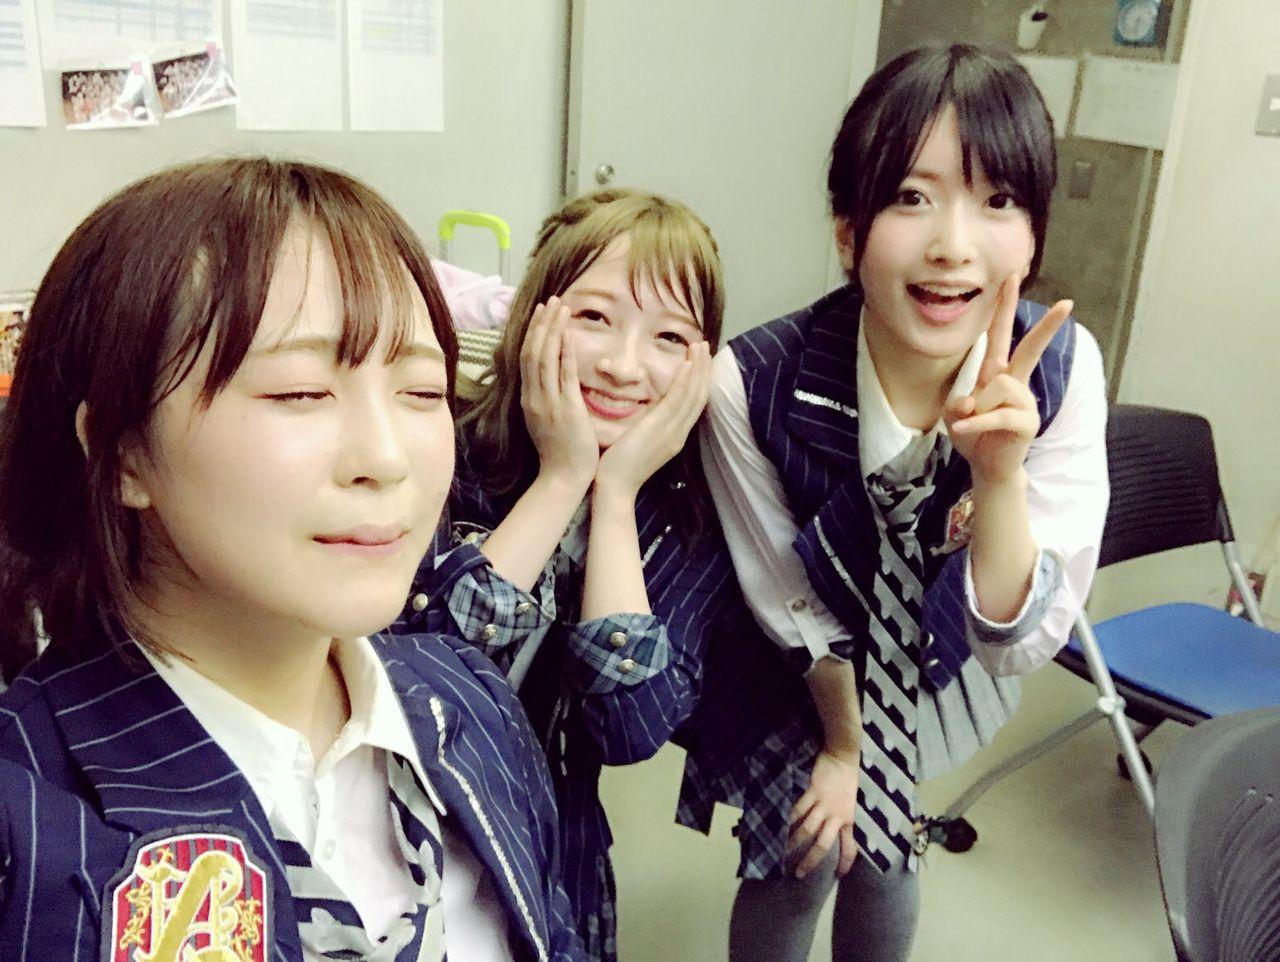 【NMB48】須藤凜々花 卒業発表、メンバーの反応などまとめ→